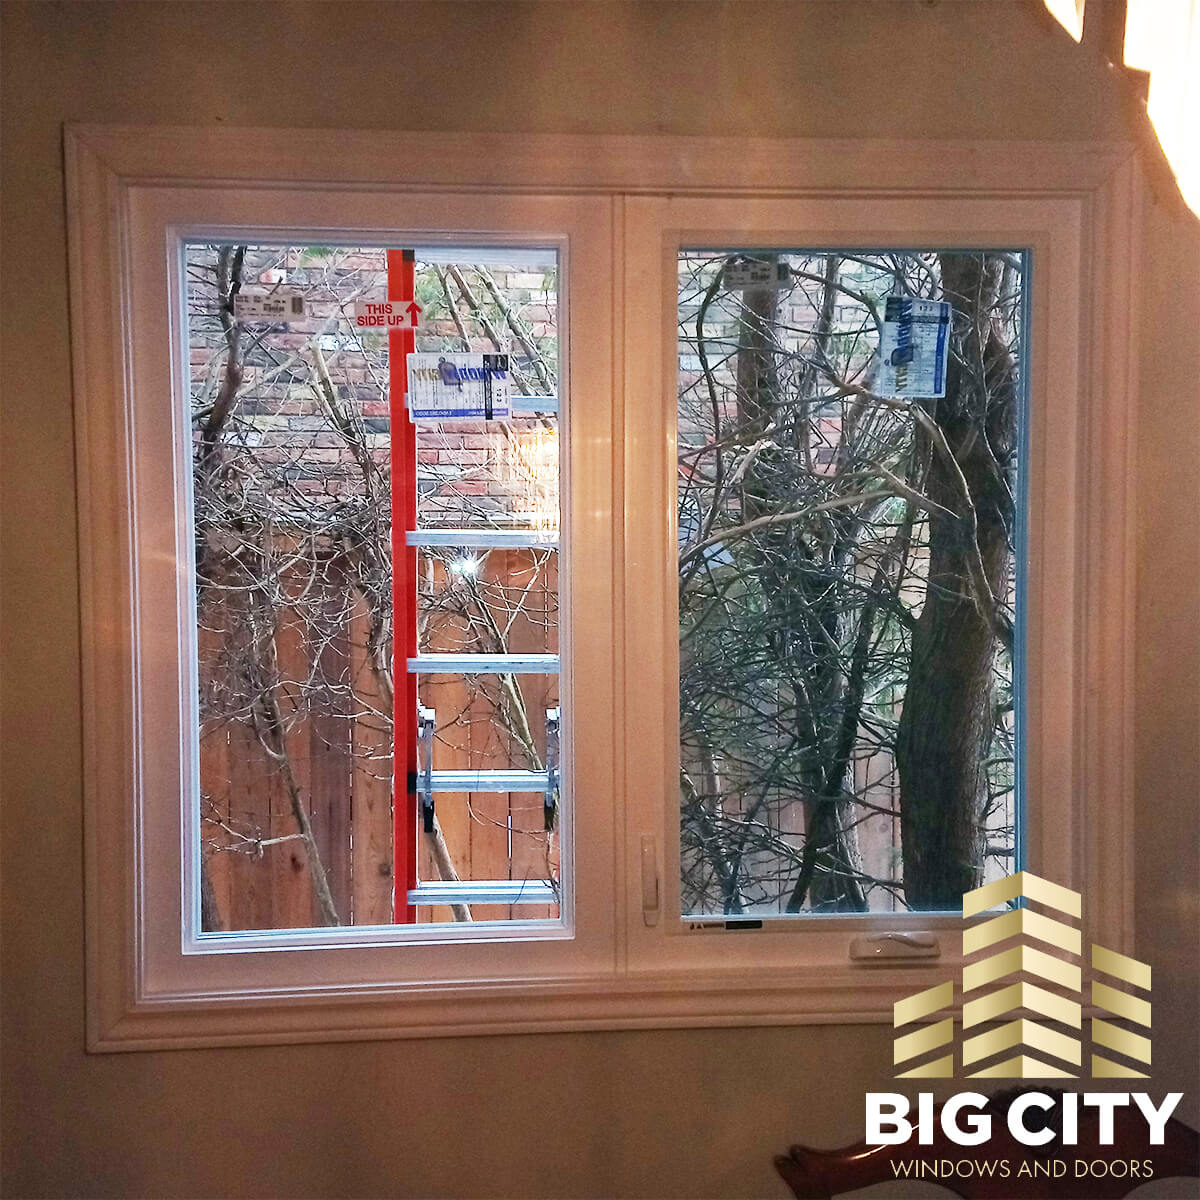 Big City Windows And Doors On Twitter Vinyl Casement Windows Are